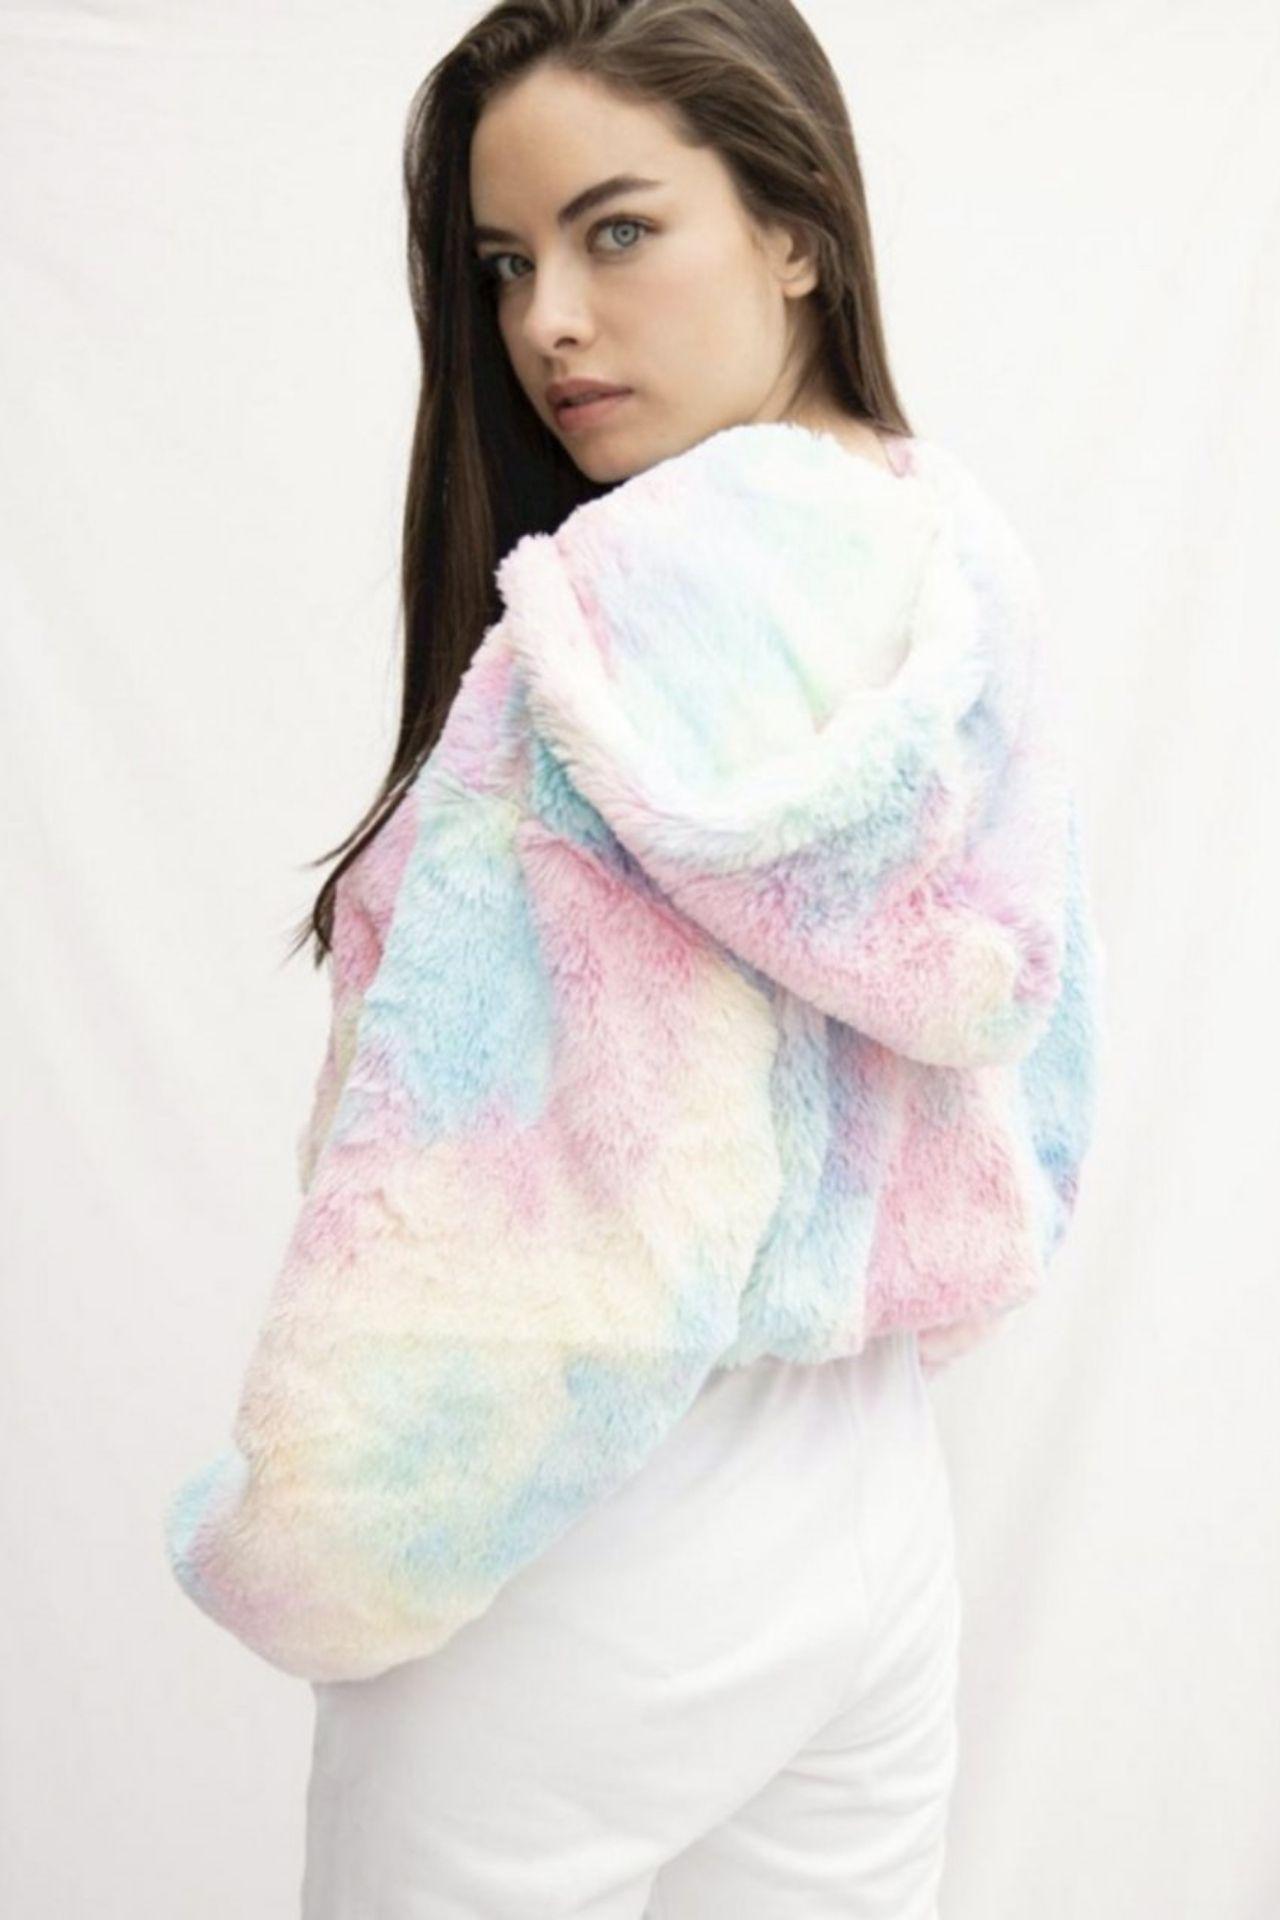 Sweater de felpa con capucha de silueta corta. Con forro de seda  Medidas: XS/SM/ML  Busto Cintura Cadera  86 cm 64 cm 73 cm  90 cm 68 cm77 cm  94 cm 72 cm  81 cm